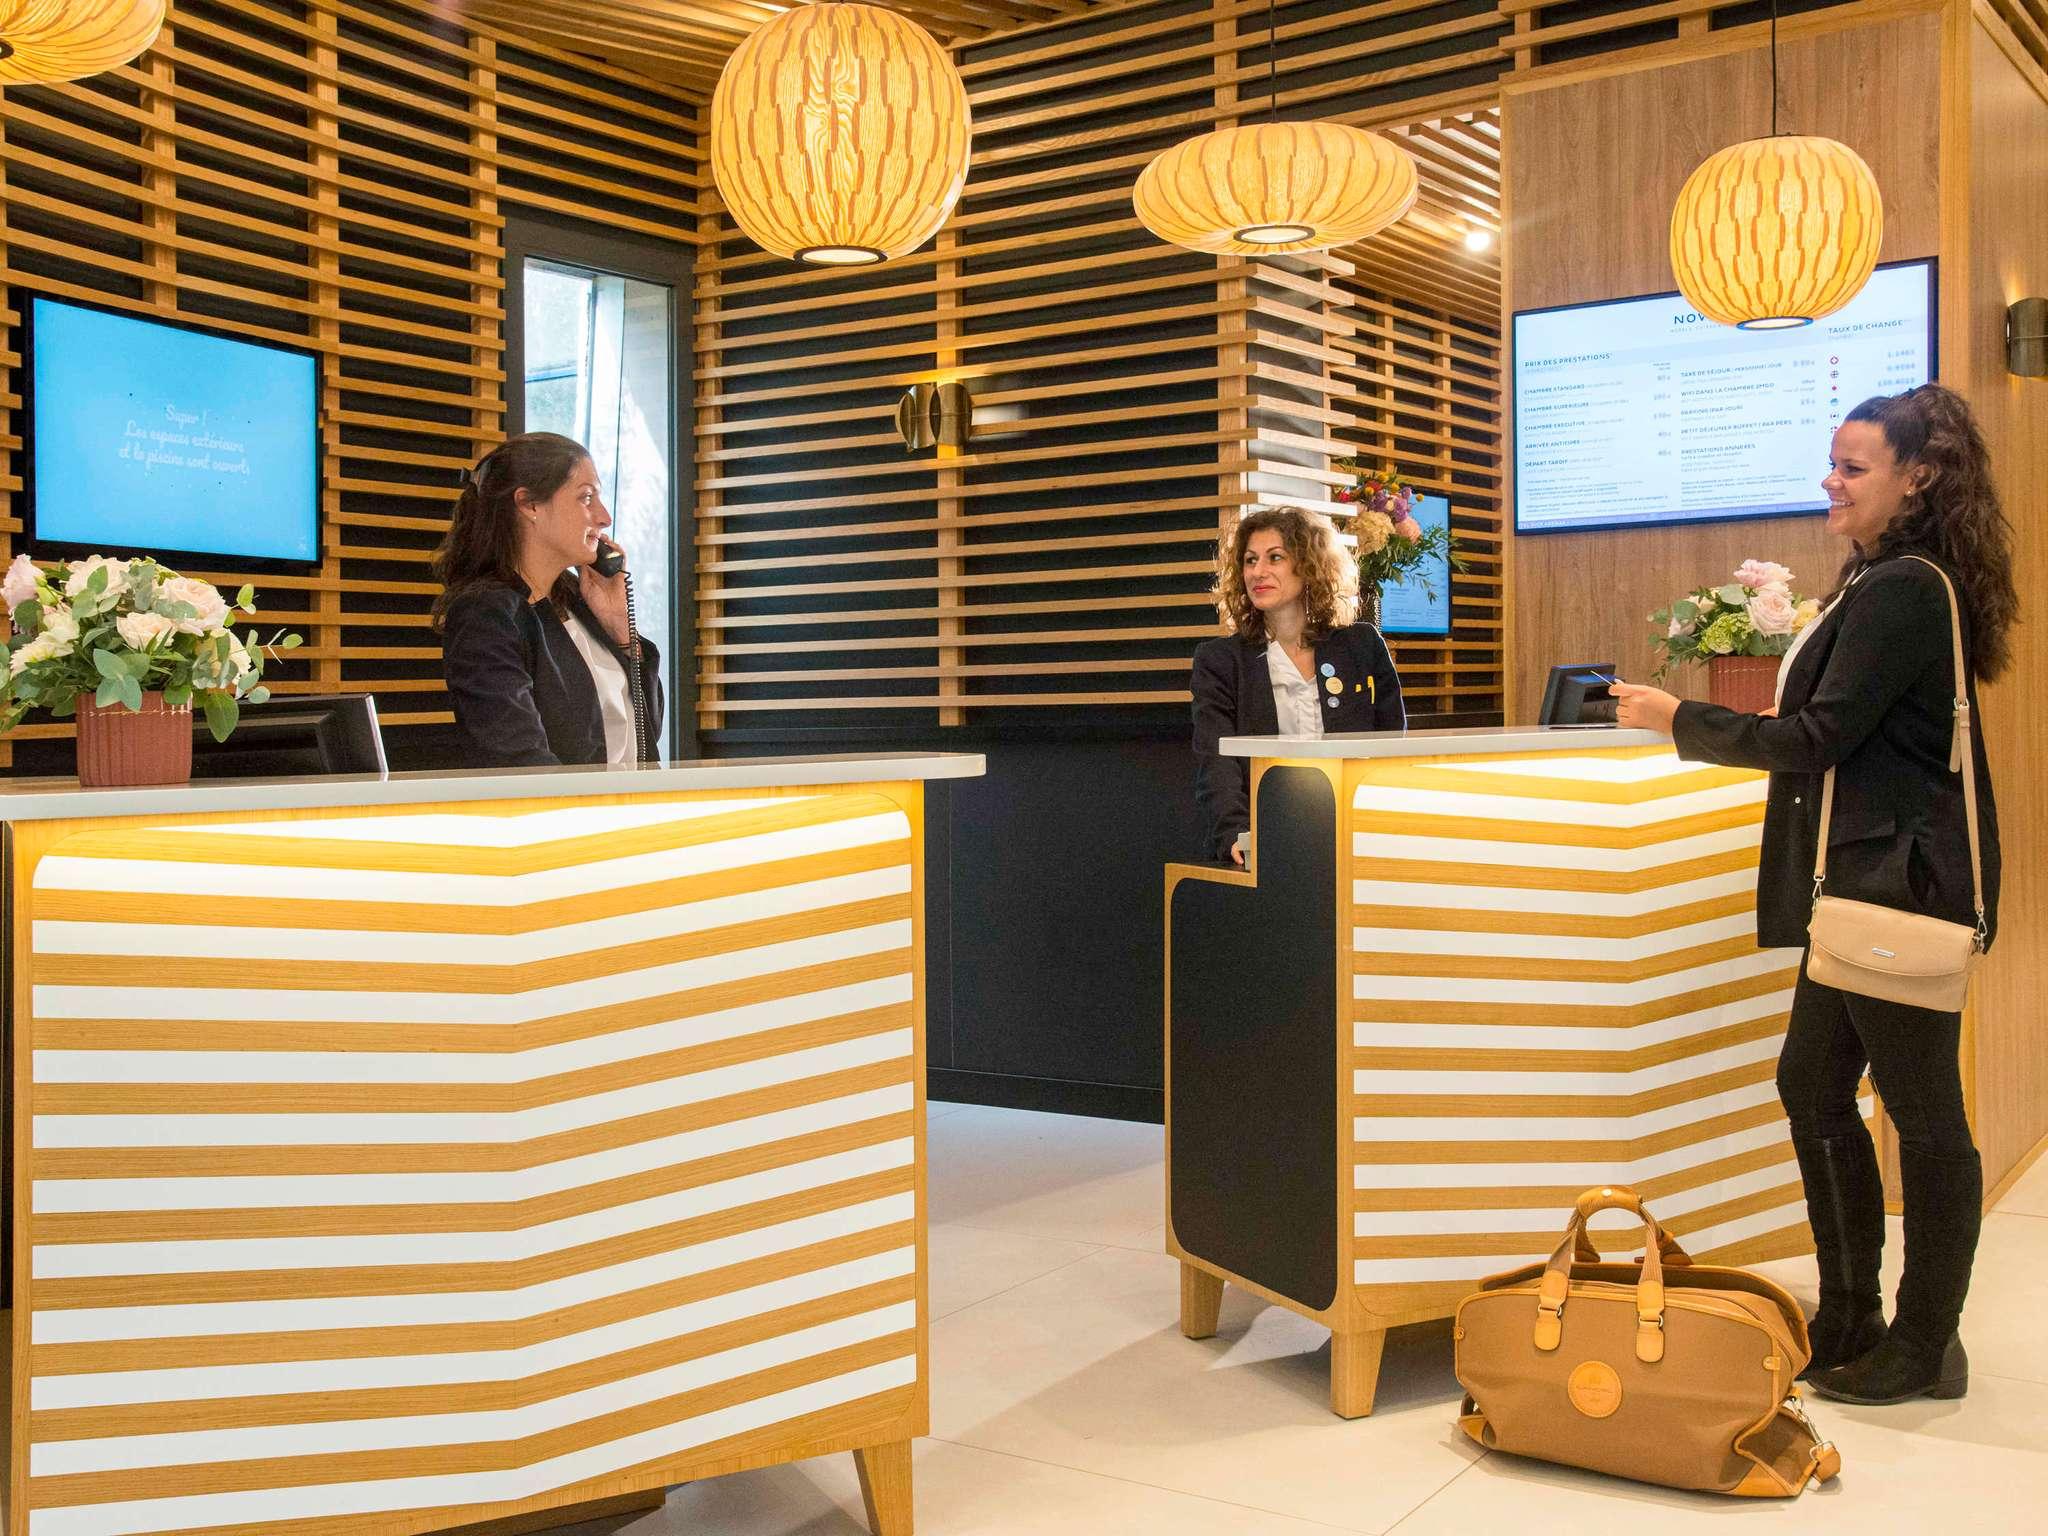 Hotel - Novotel Nice Arénas Airport